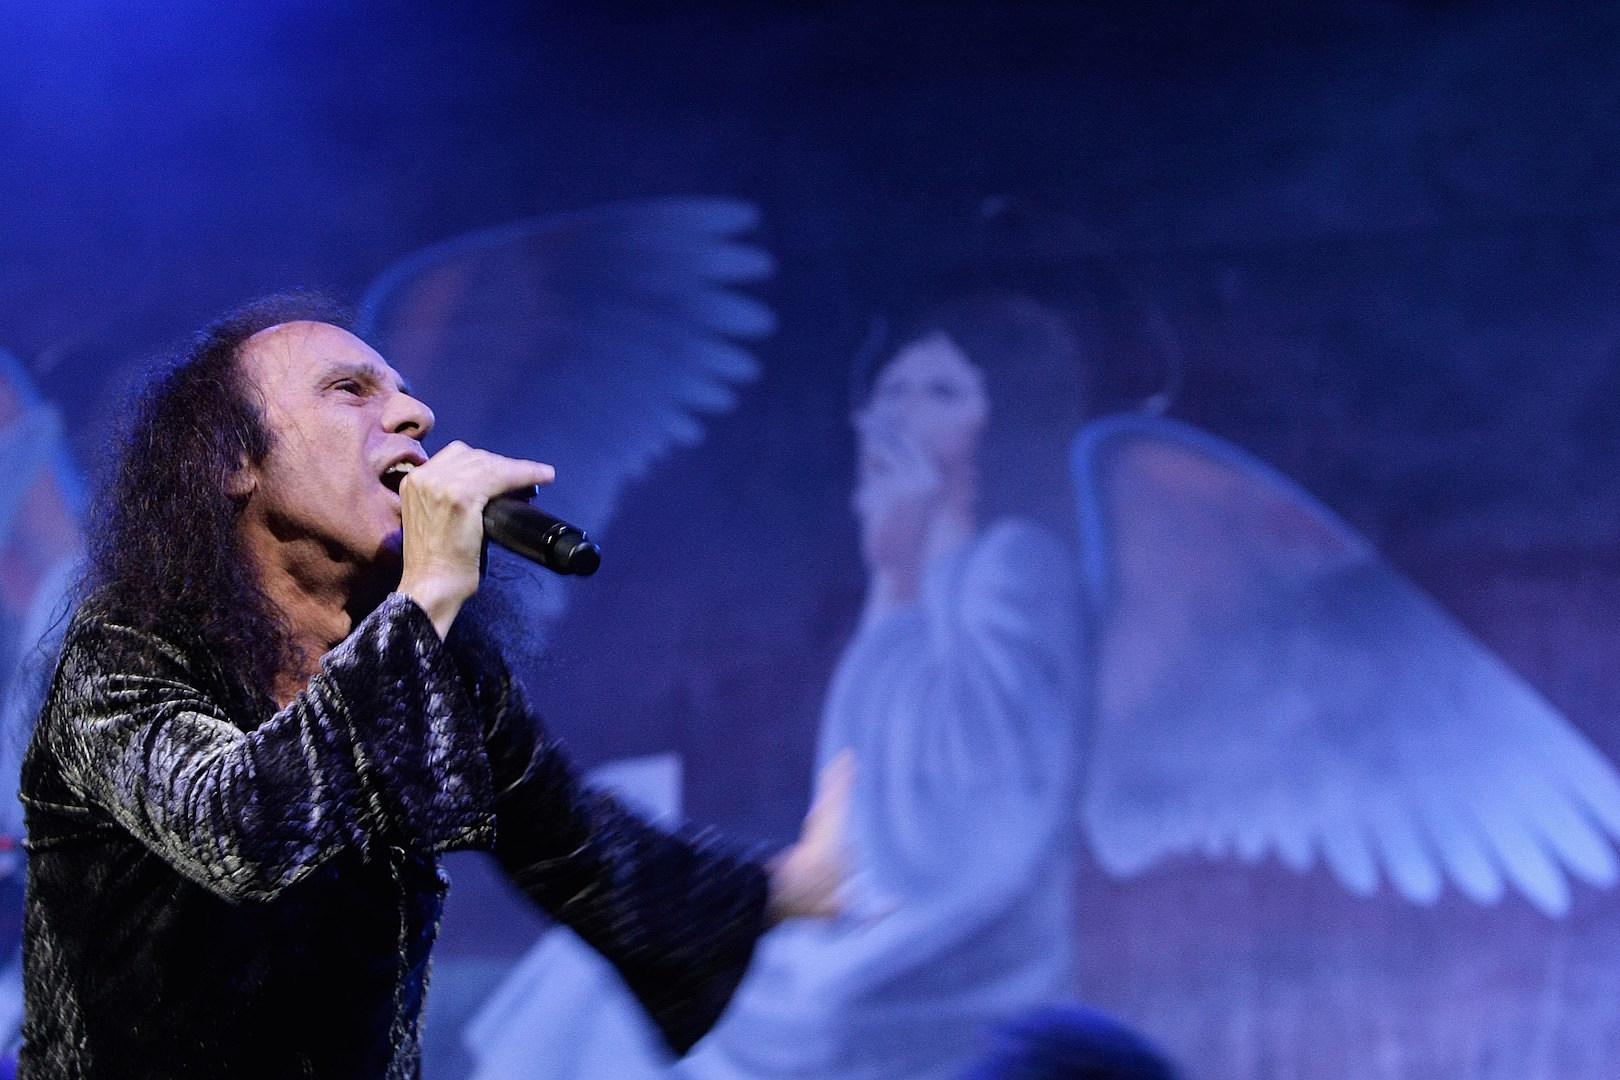 Major Ronnie James Dio Auction Set for September 2018